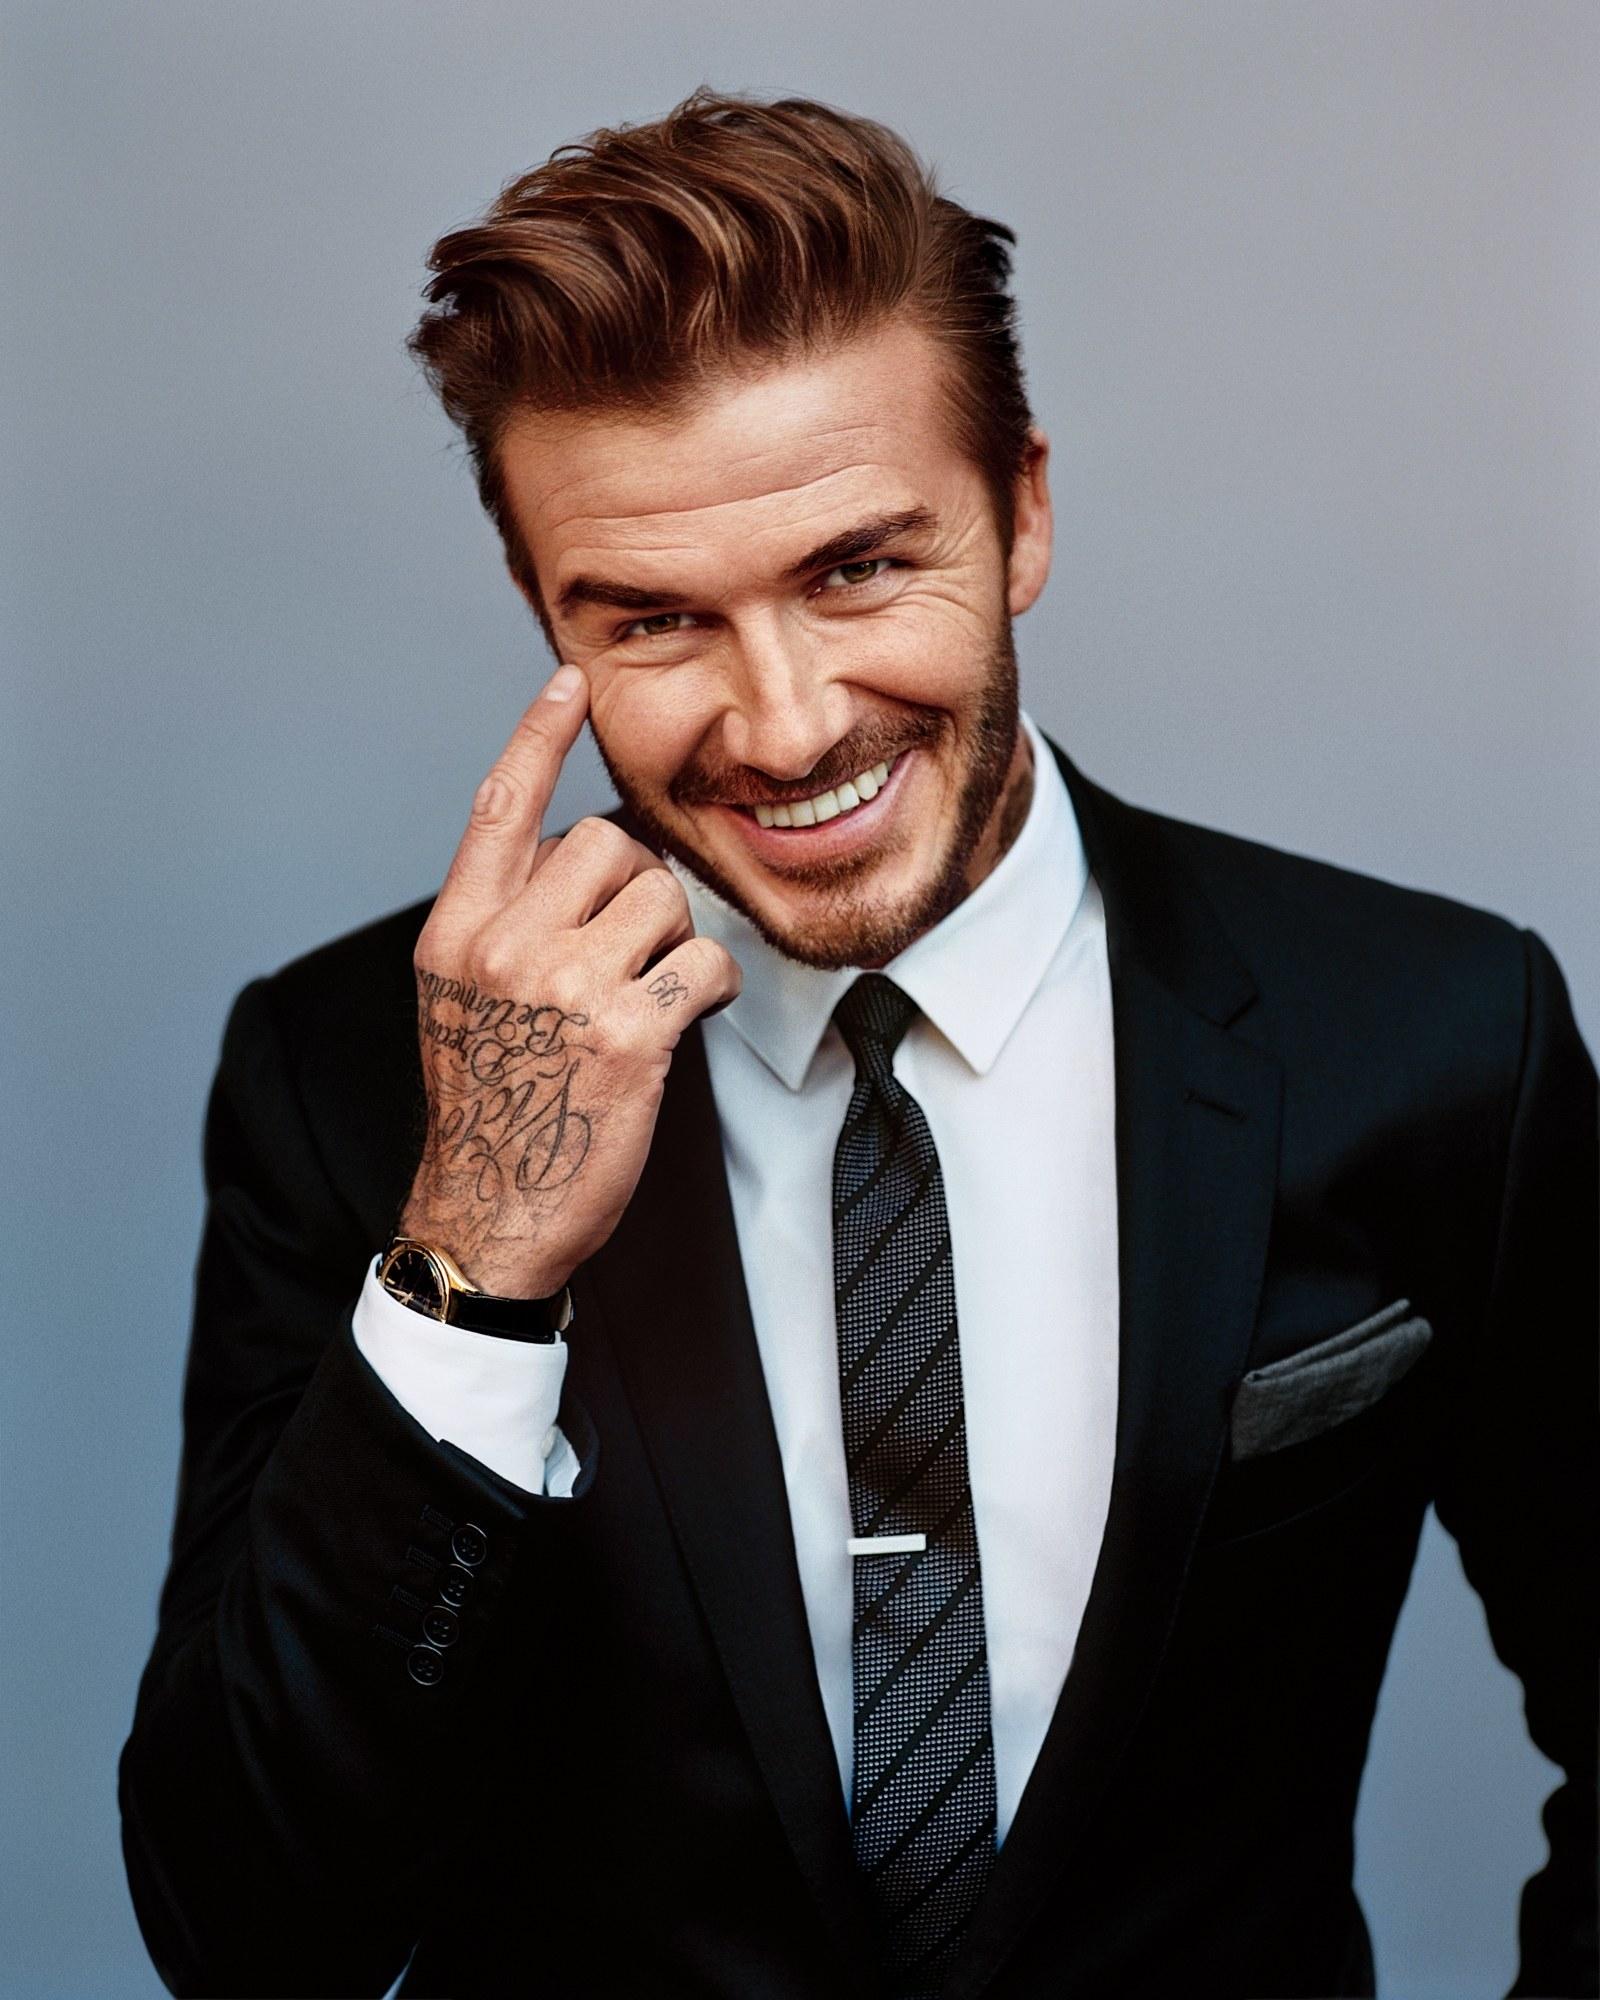 FIFA 2018 Series: David Beckham's London mansion worth $45 ...